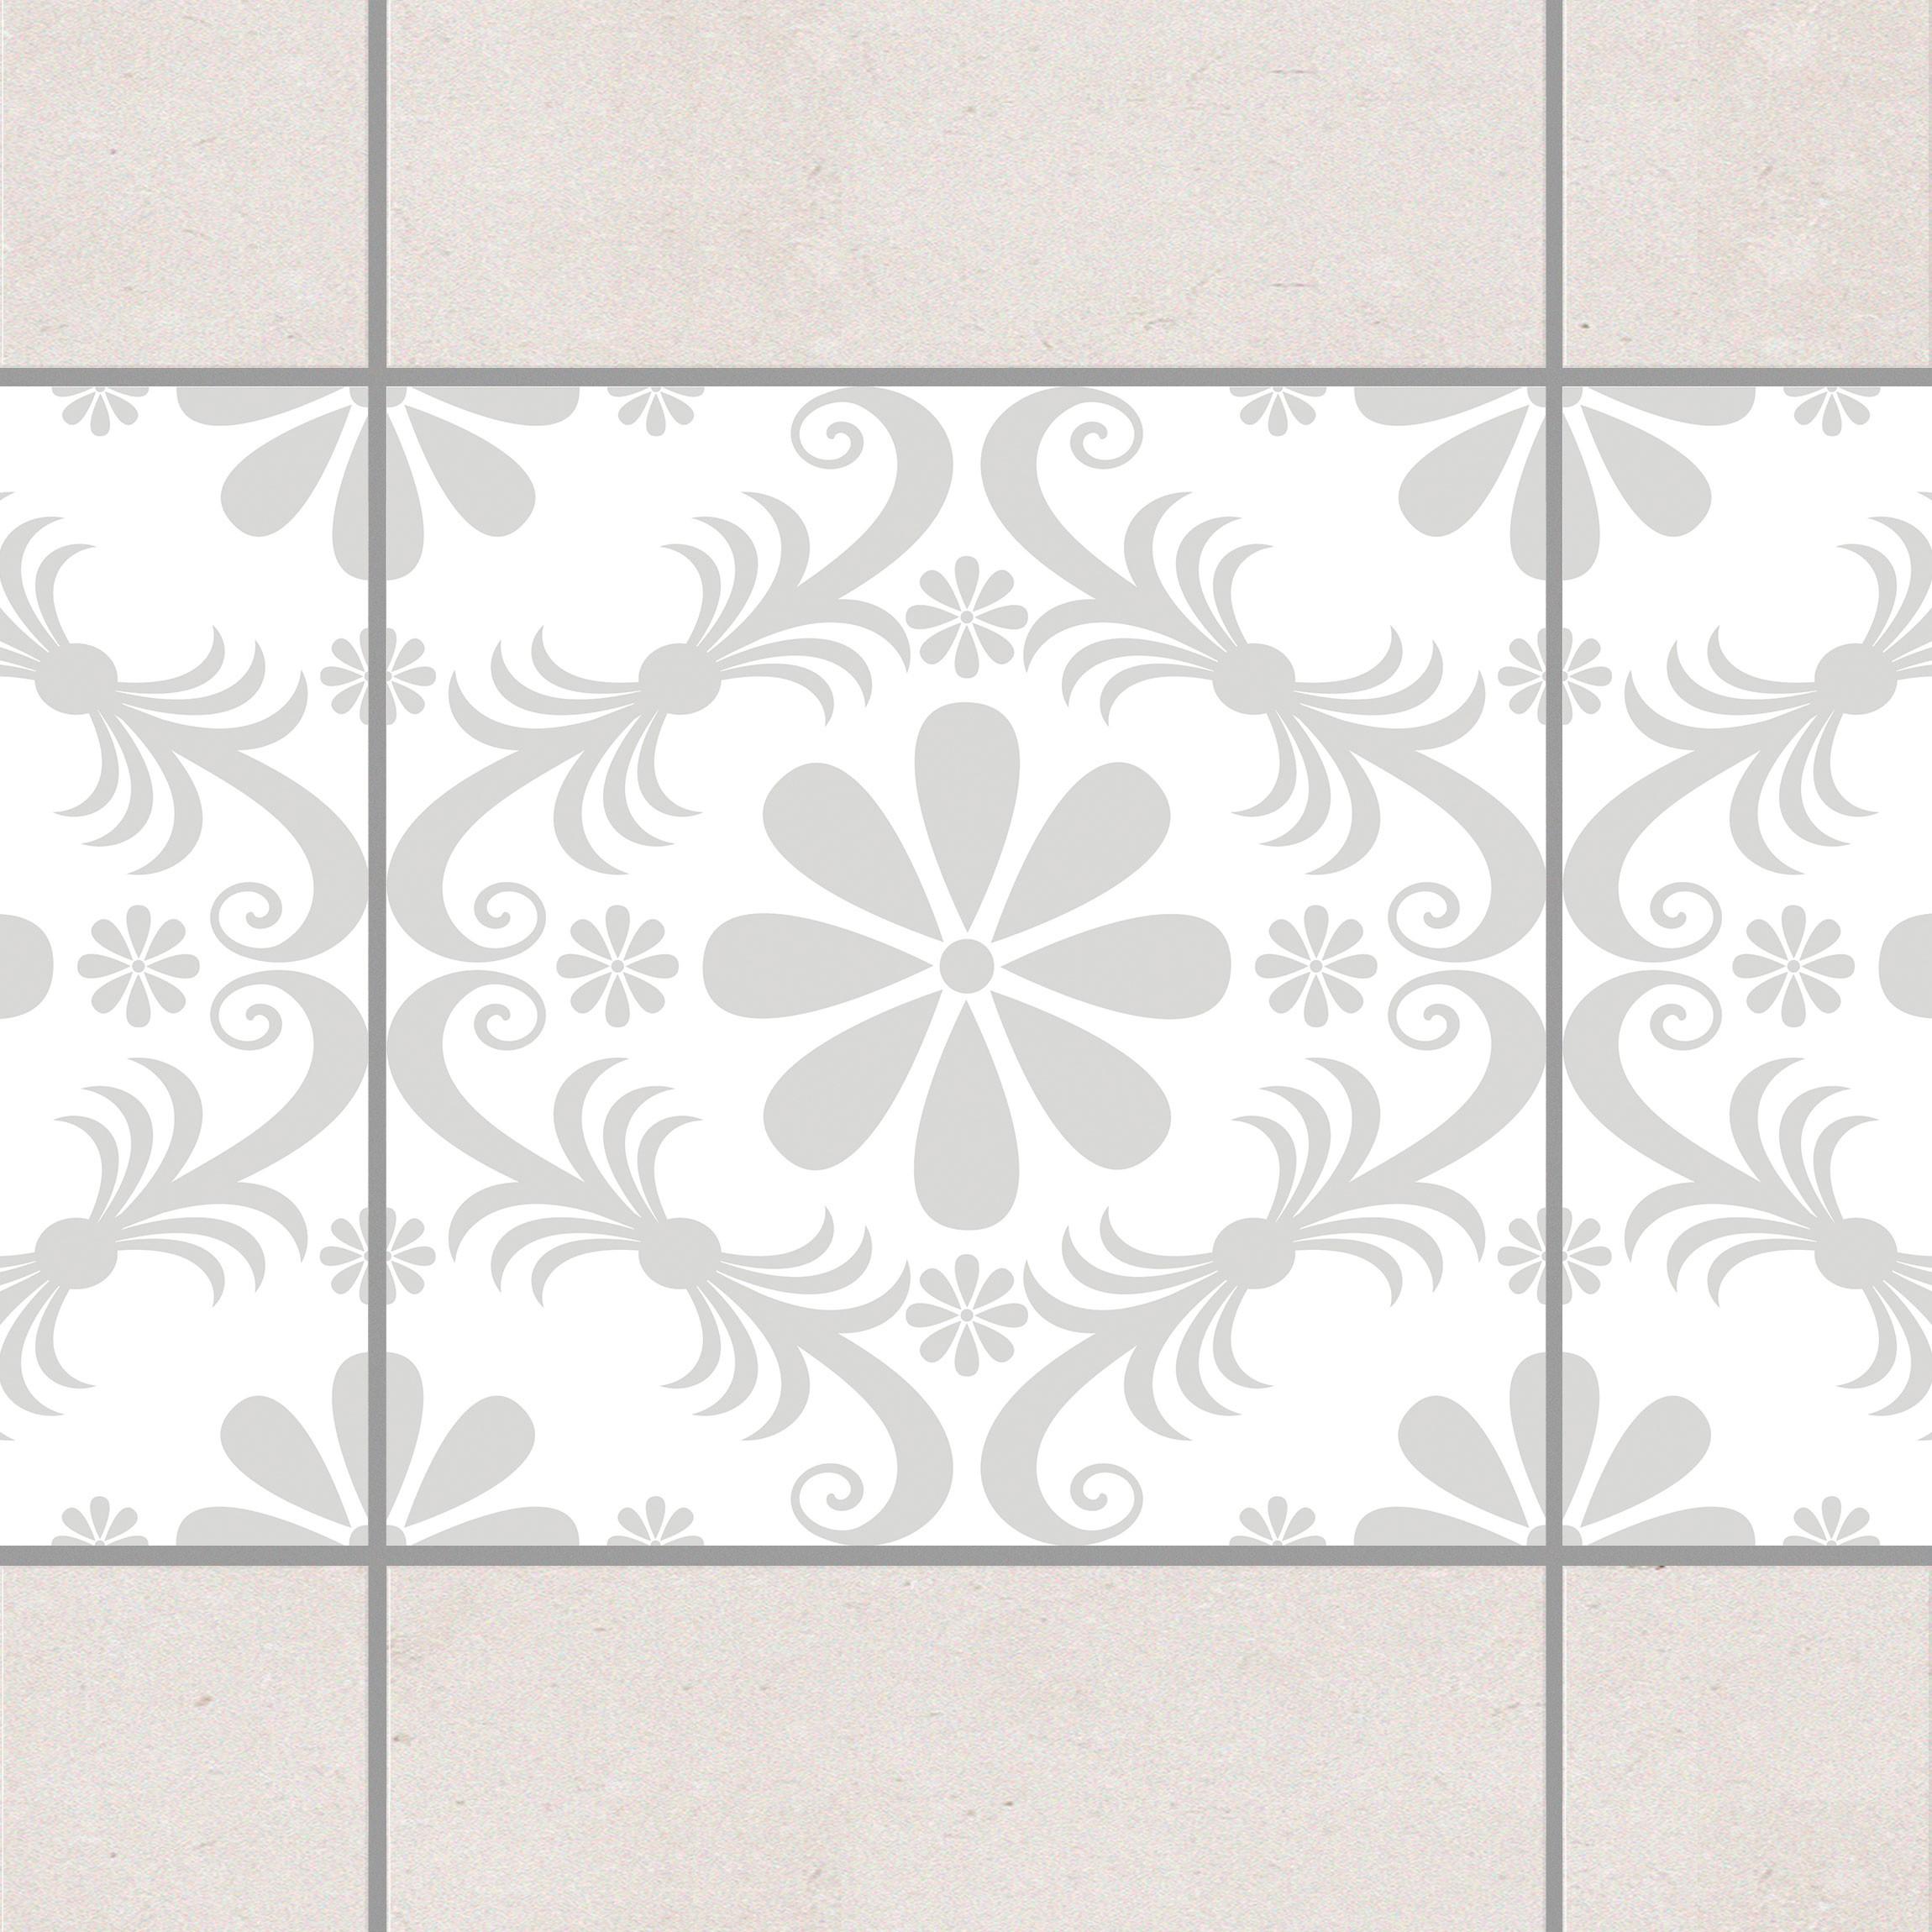 fliesen bord re blumendesign white light grey 10x10 cm fliesenaufkleber grau. Black Bedroom Furniture Sets. Home Design Ideas